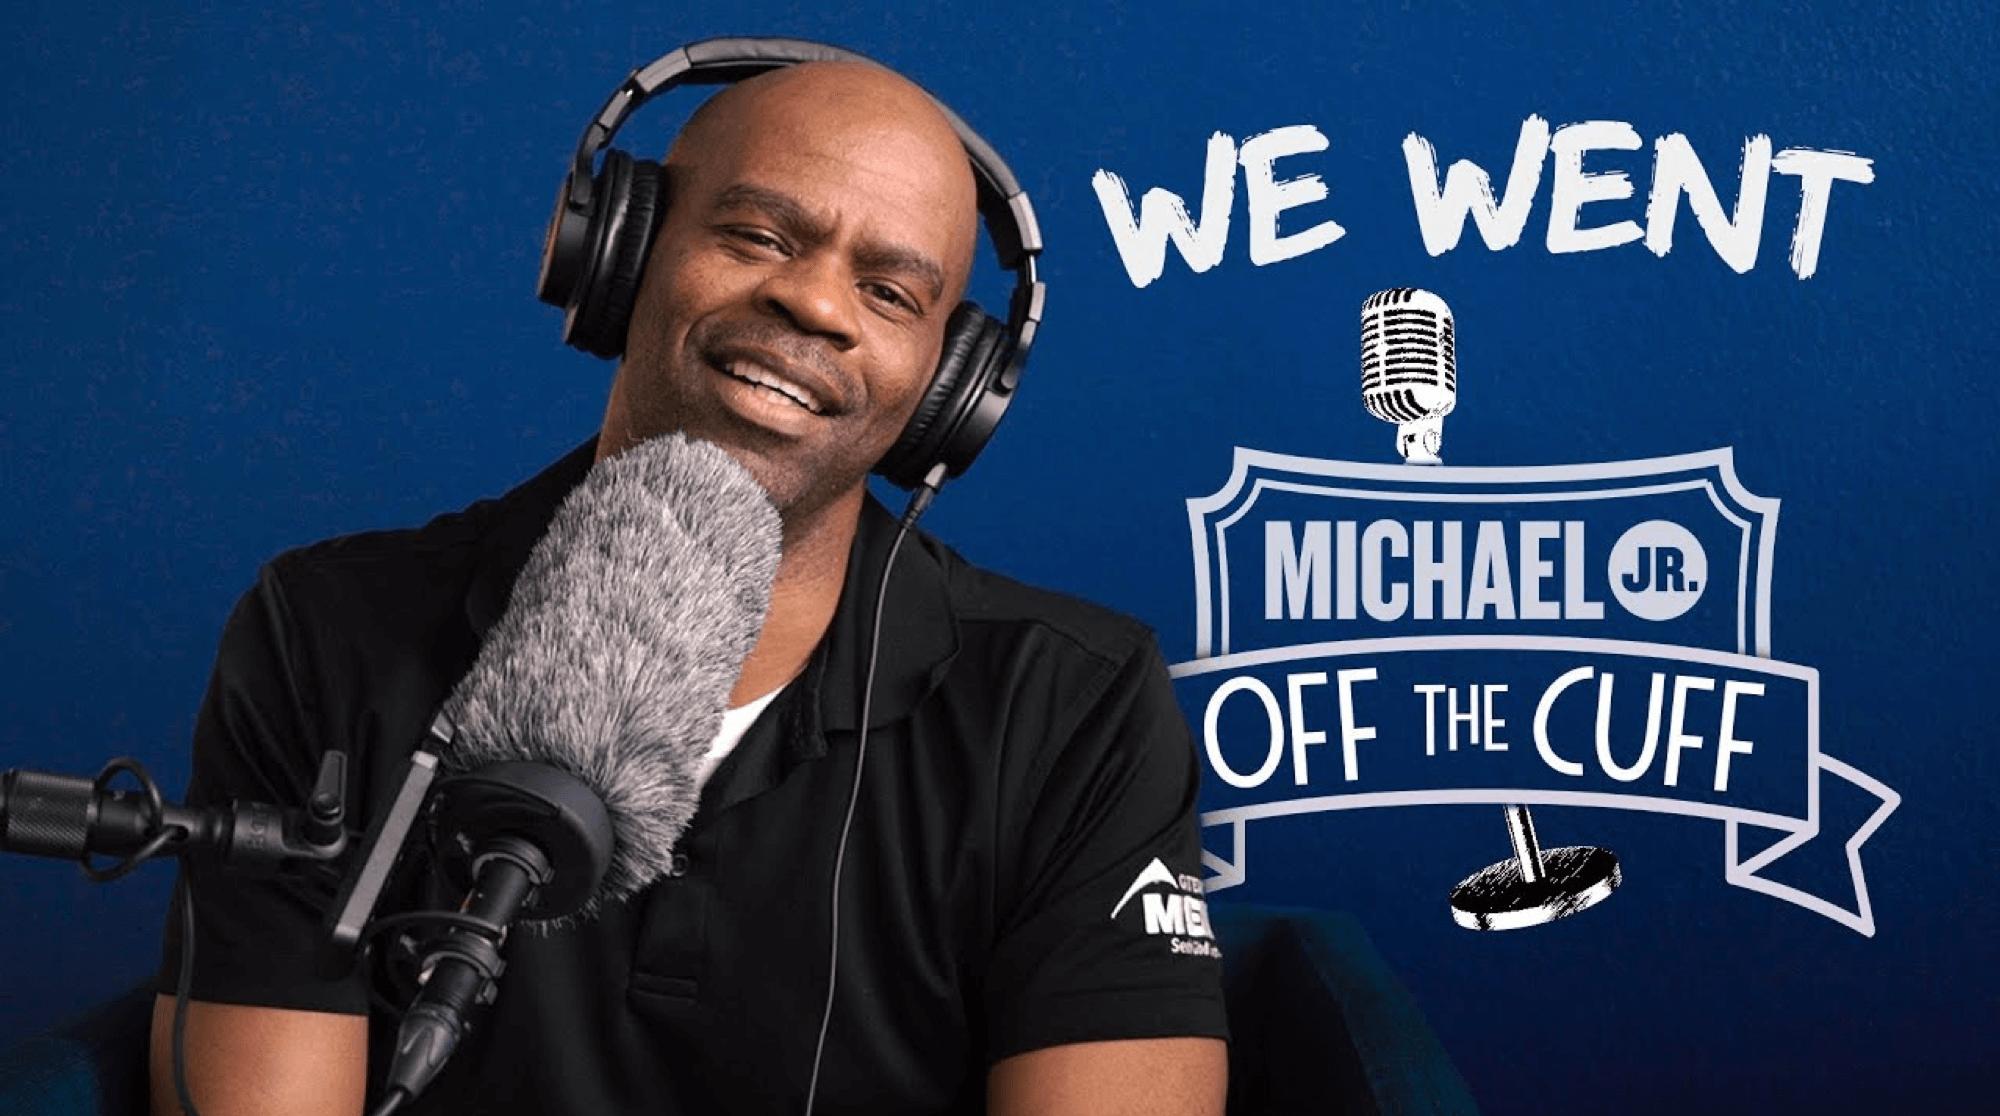 best-christian-podcasts-michael-jr-comedian-podcast-fi